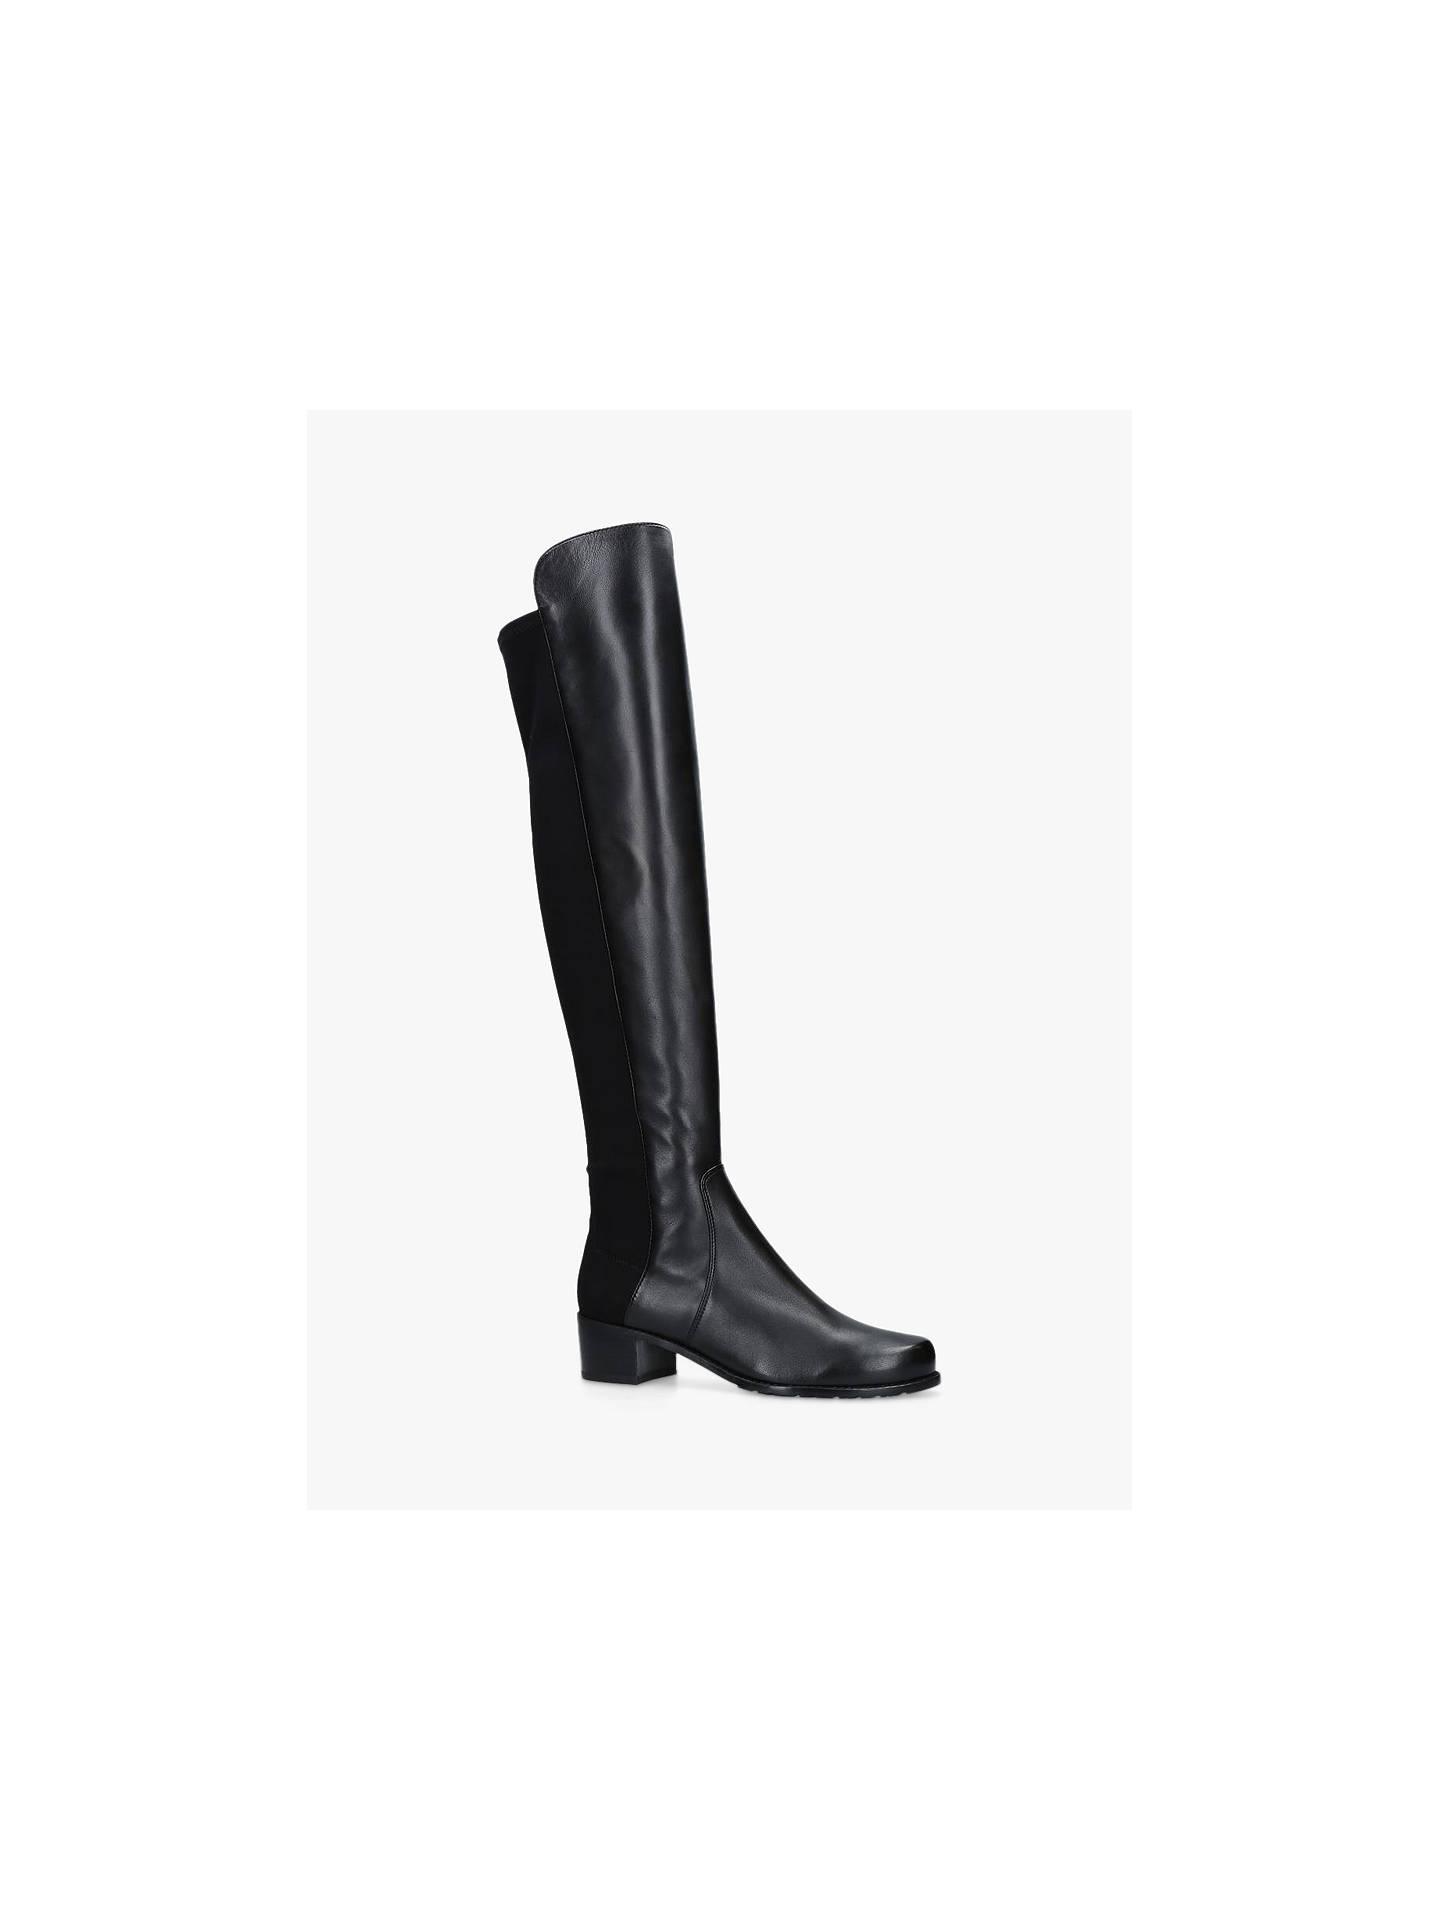 3445a6115fc Stuart Weitzman Reserve Block Heel Knee High Boots at John Lewis ...